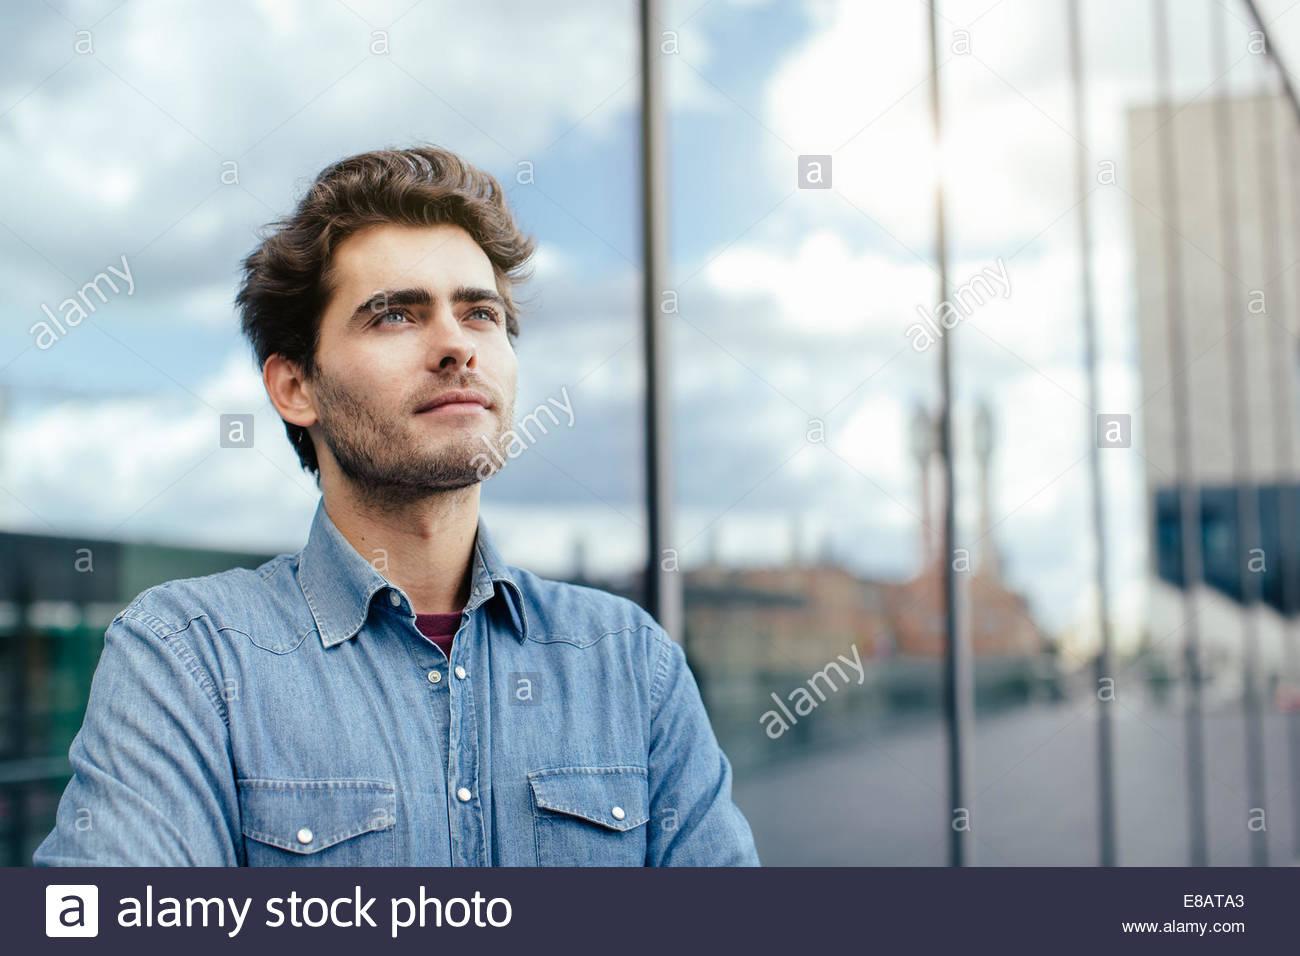 Joven por la ventana Imagen De Stock